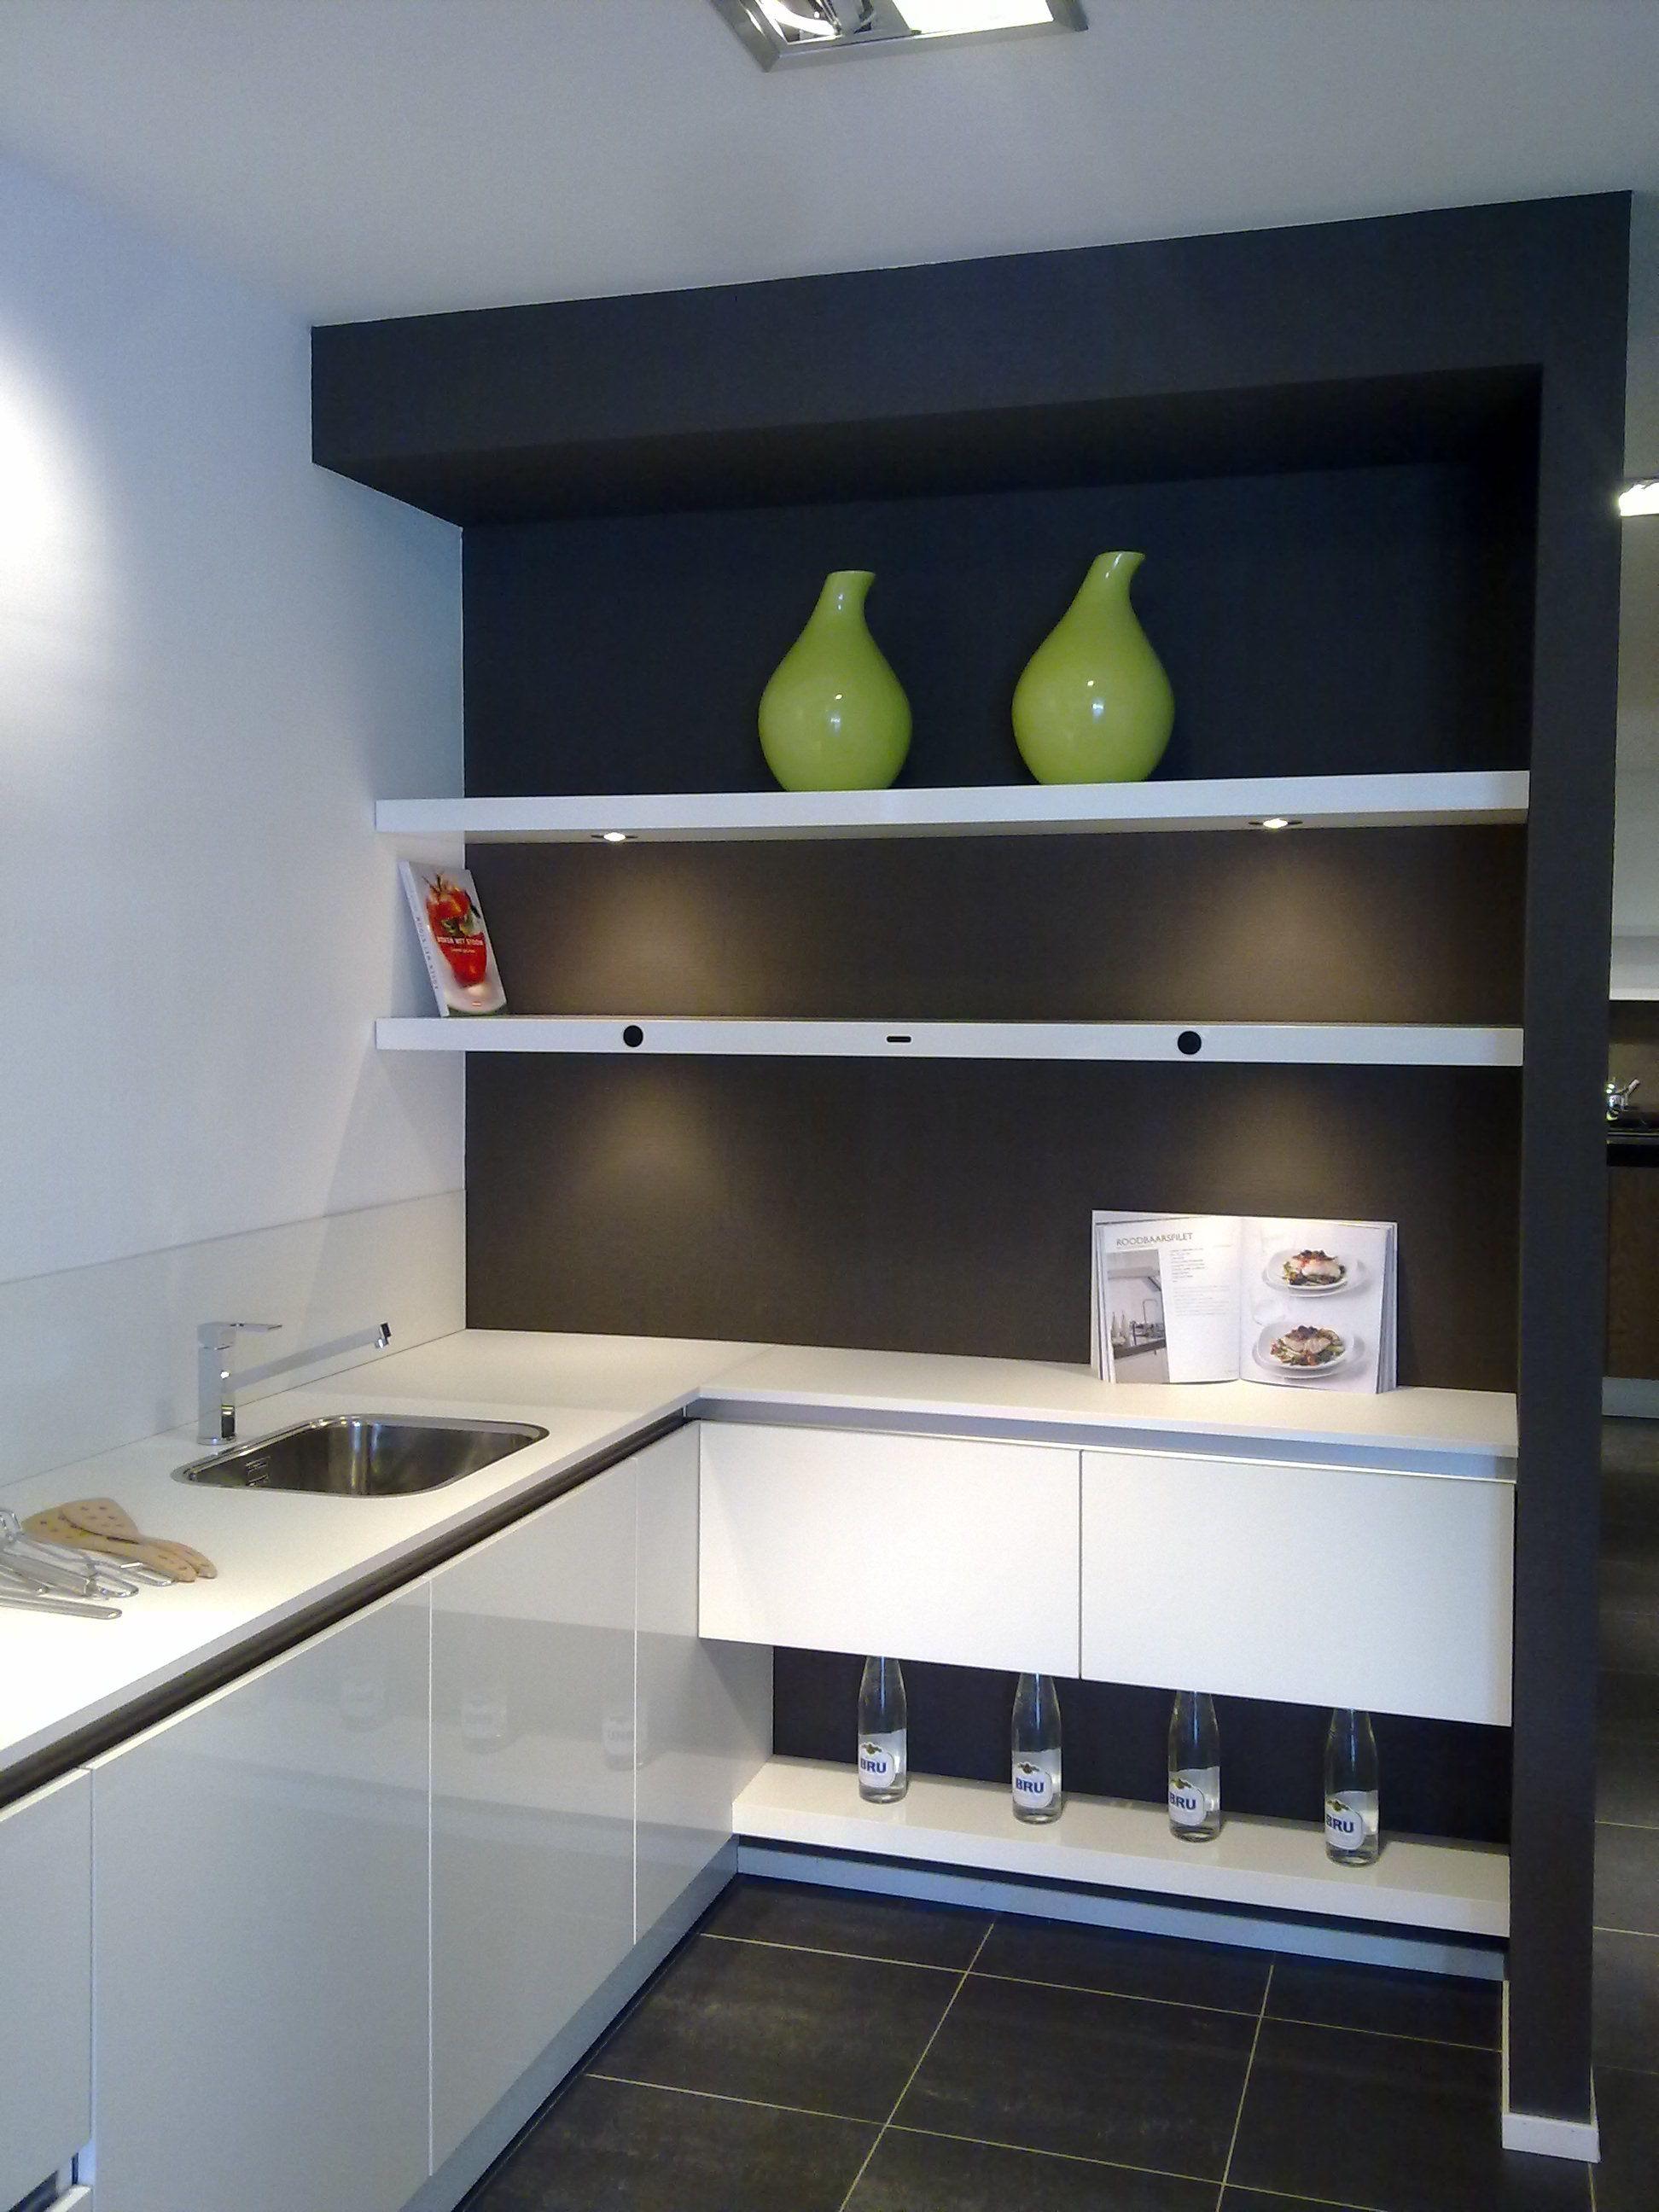 Witte Hoogglans Greeploze Keuken : beste keukenprijs! Greeploze witte hoogglans Keller keuken [37463